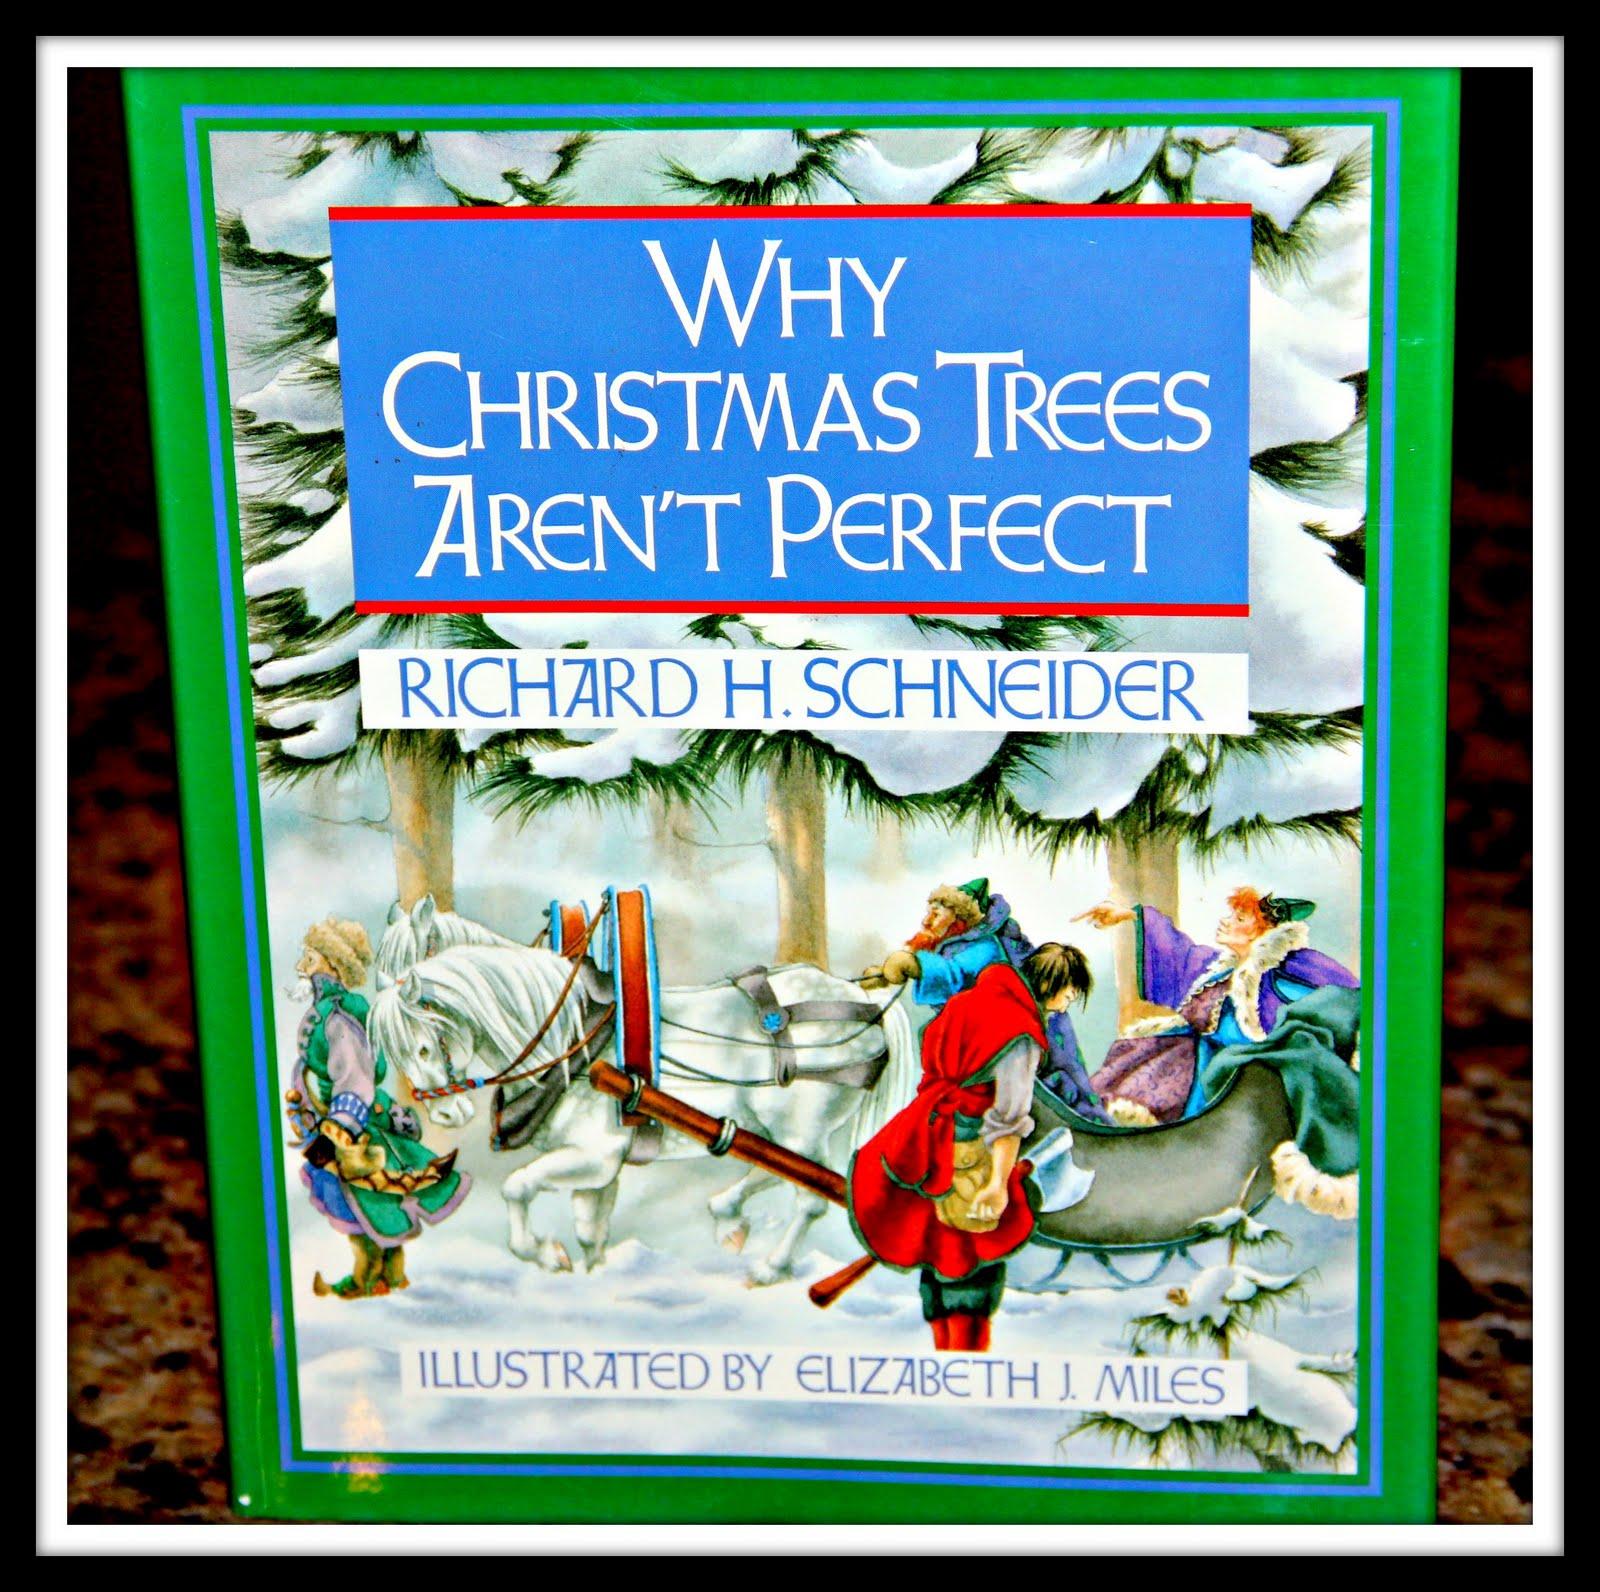 Why Christmas Trees: Blue Skies Ahead: Christmas Tree Family Home Evening